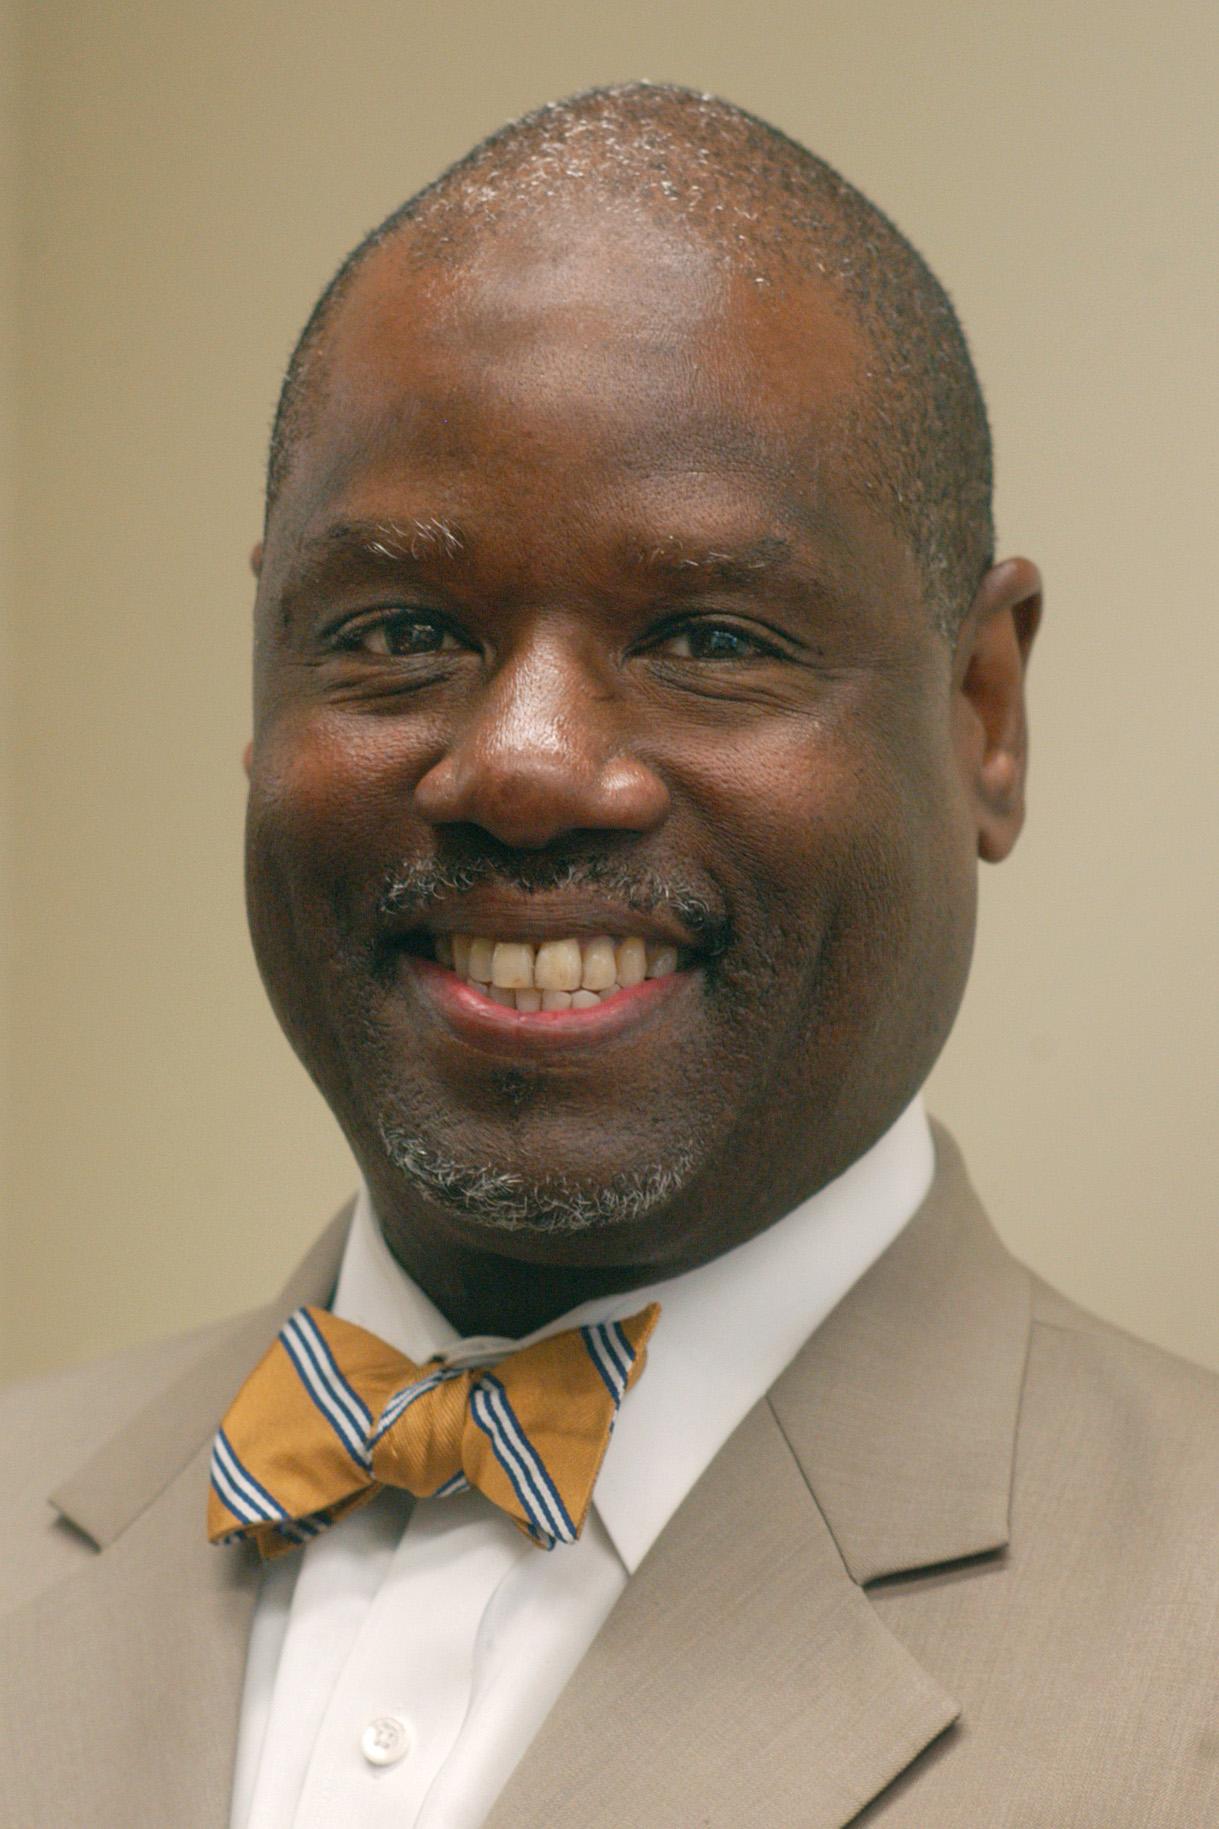 The Rev. Larry Pickens